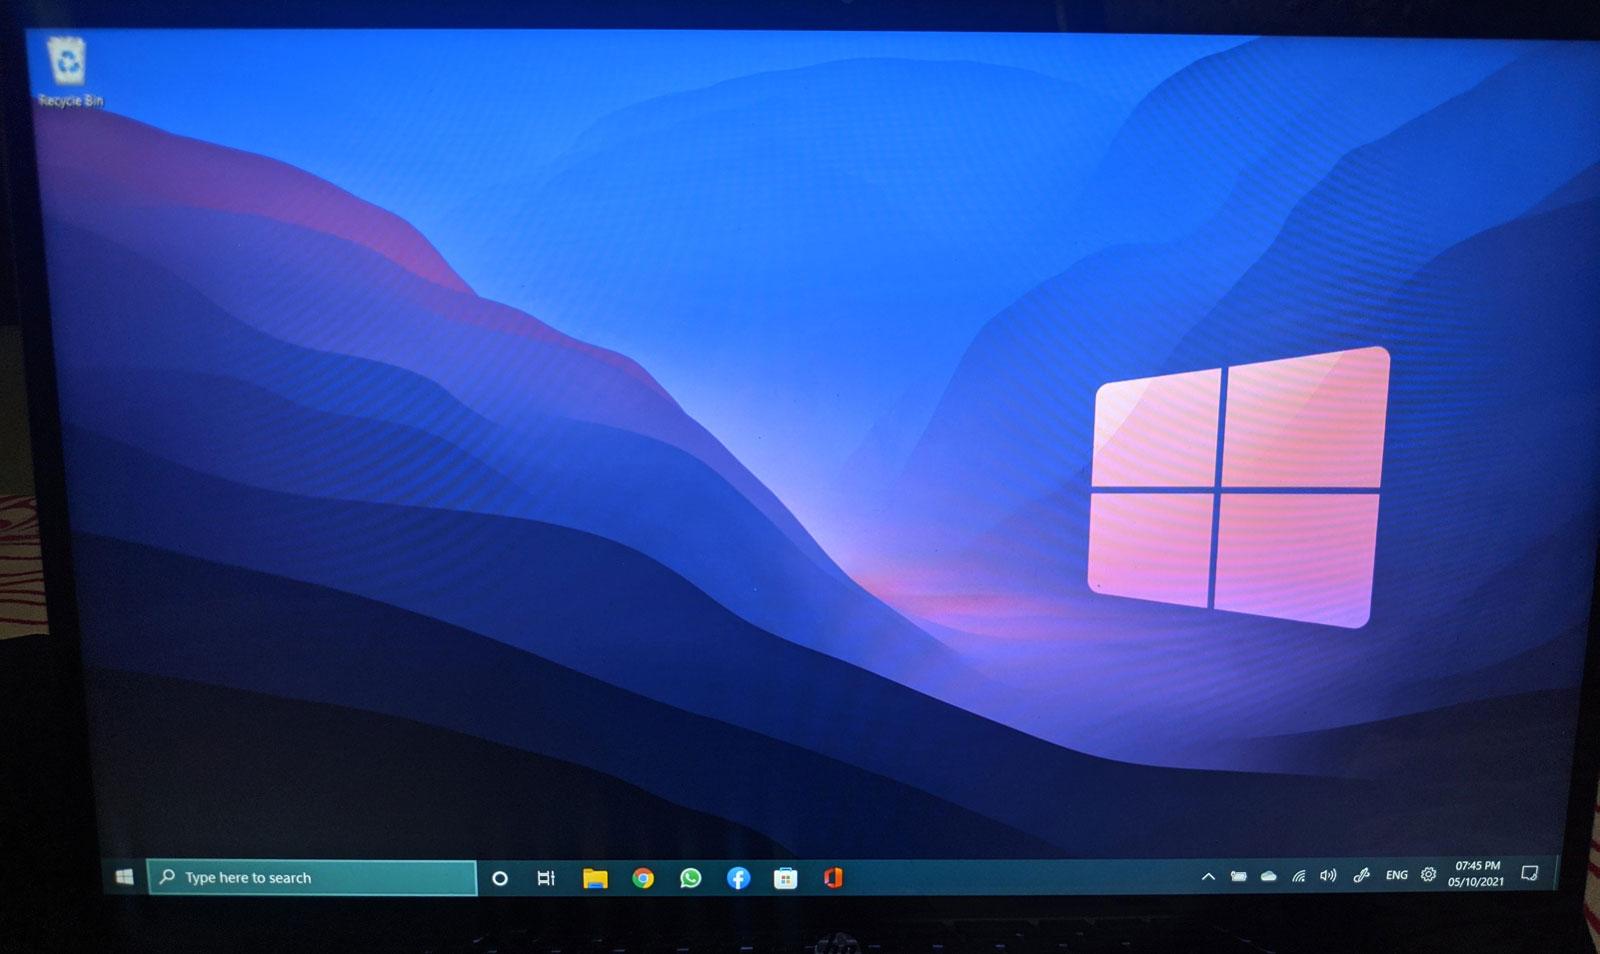 Windows 11'de Windows 10 görev çubuğu